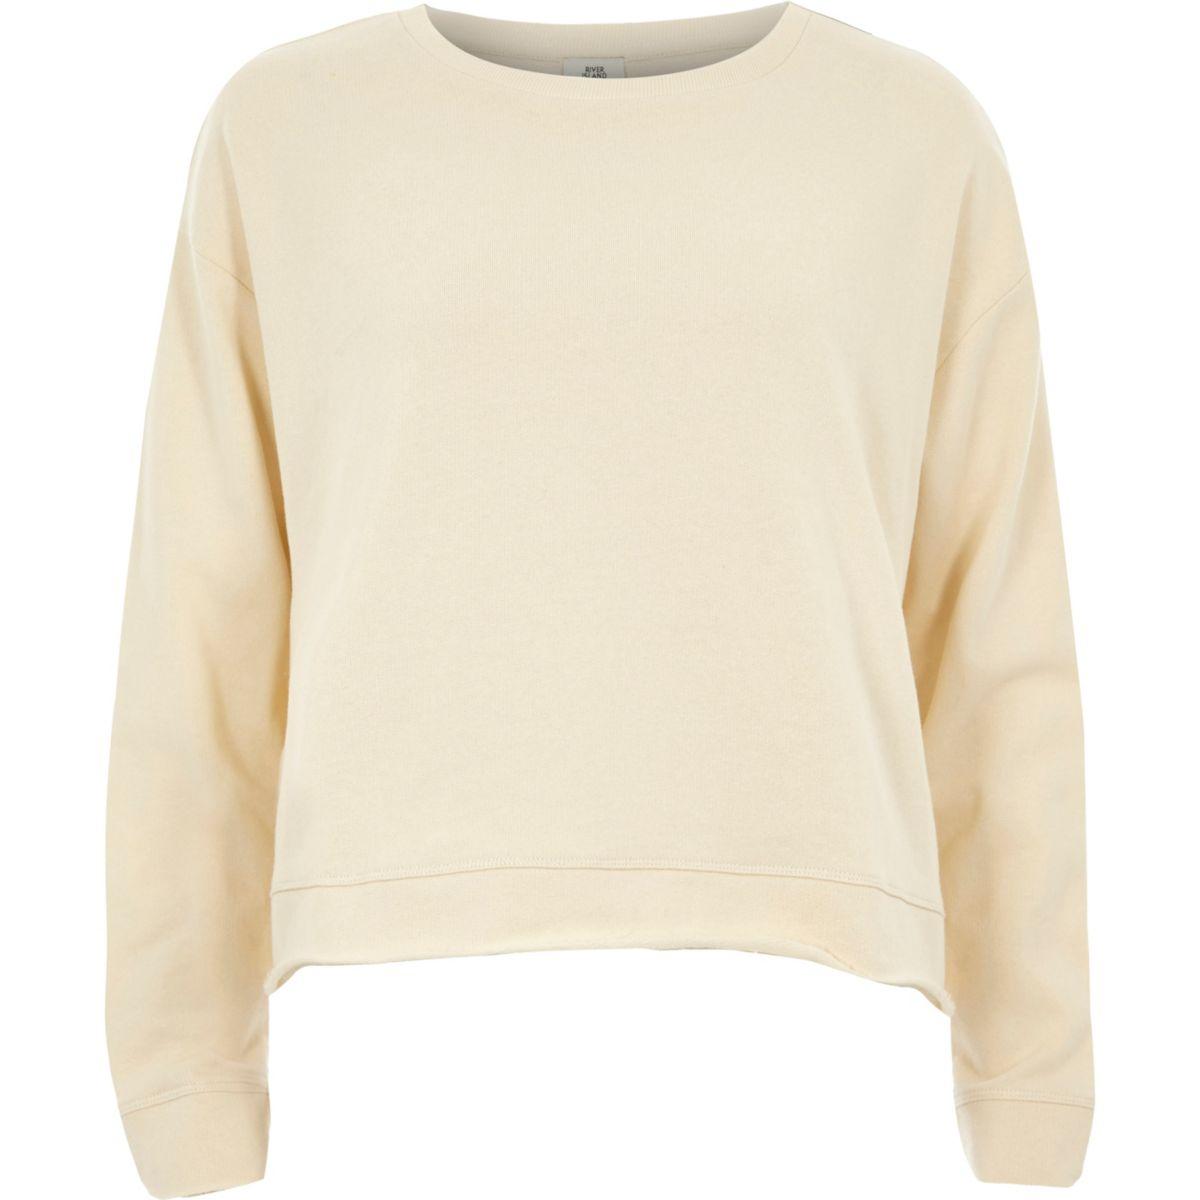 Cream frill tie back sweatshirt